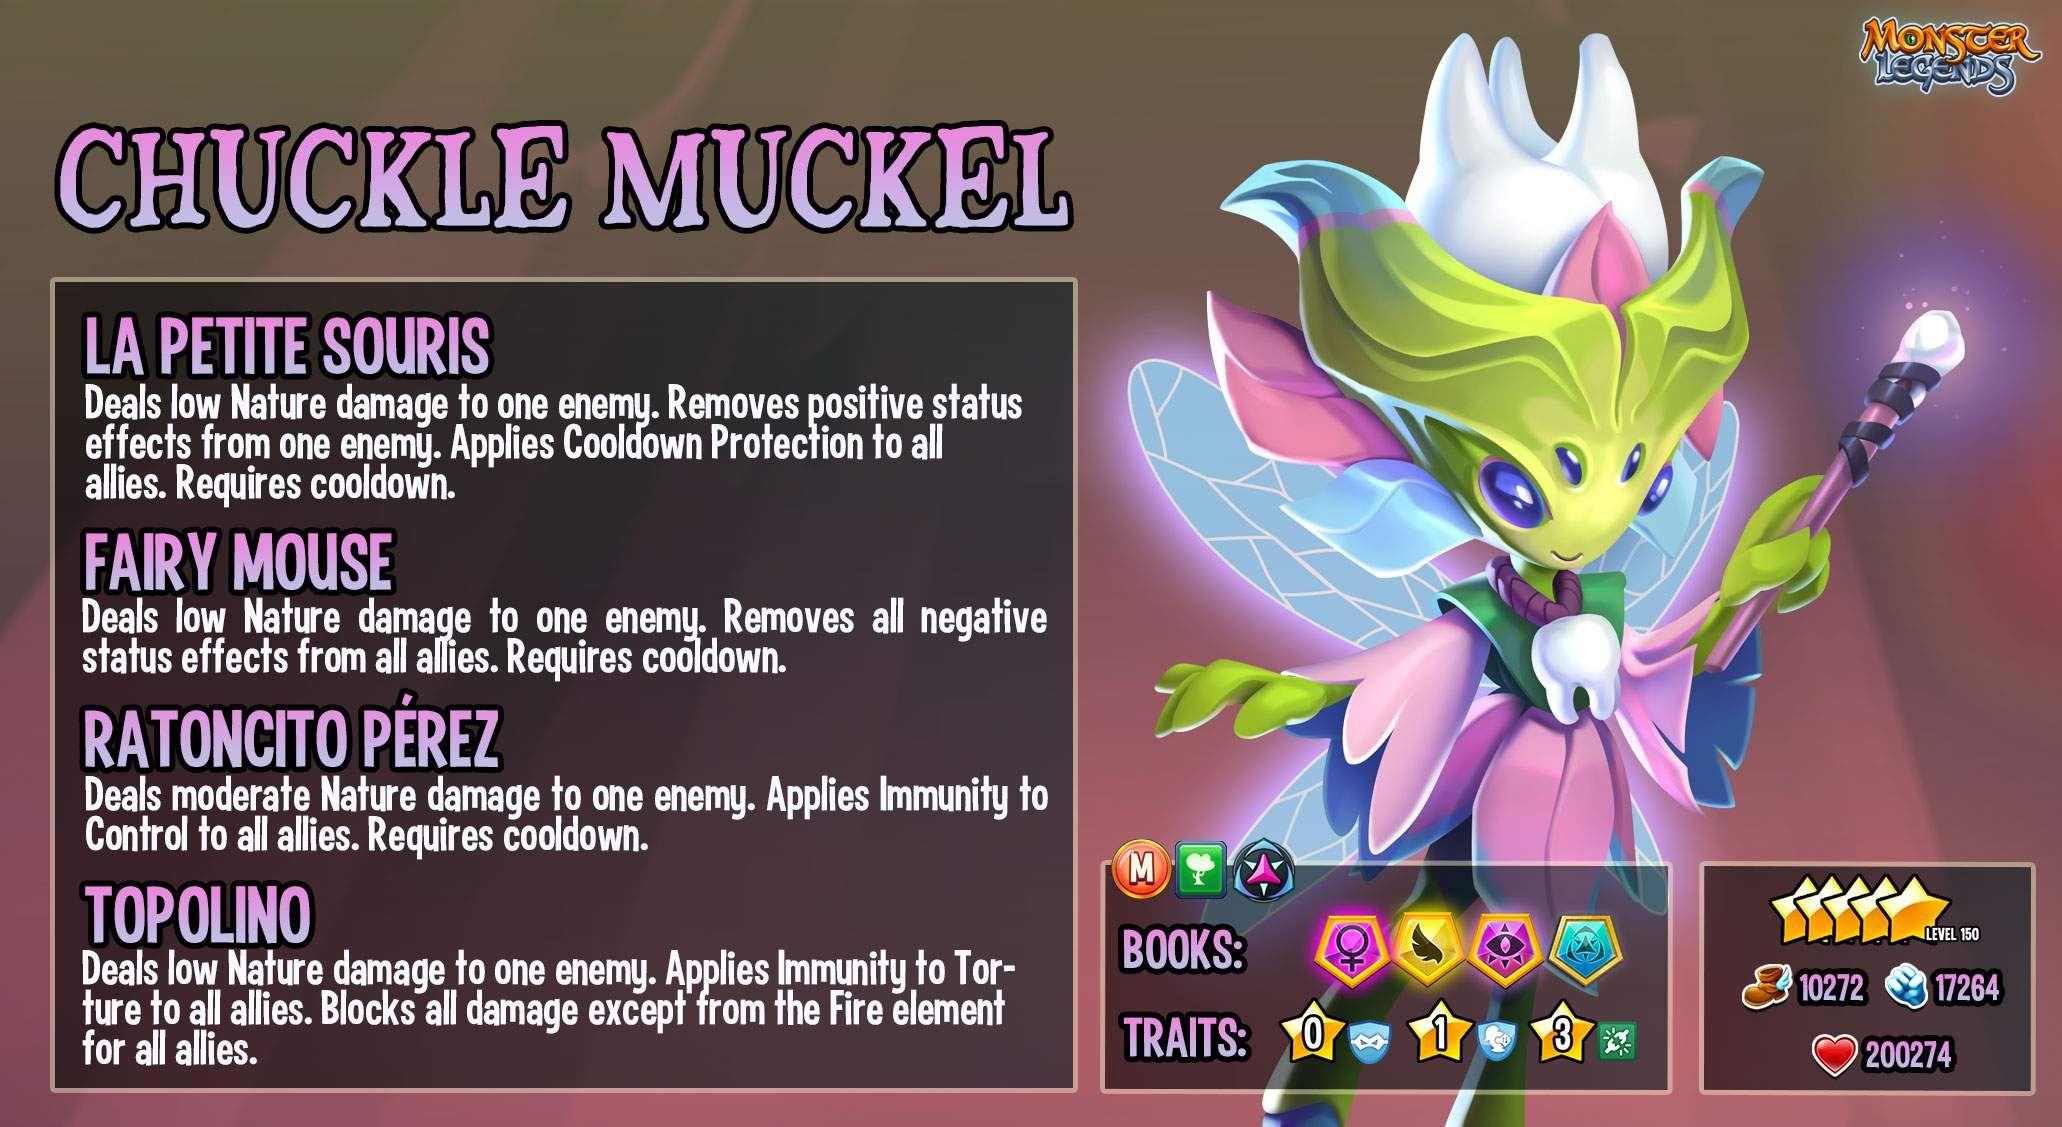 0_1600374035861_Chuckle-Muckle.jpg